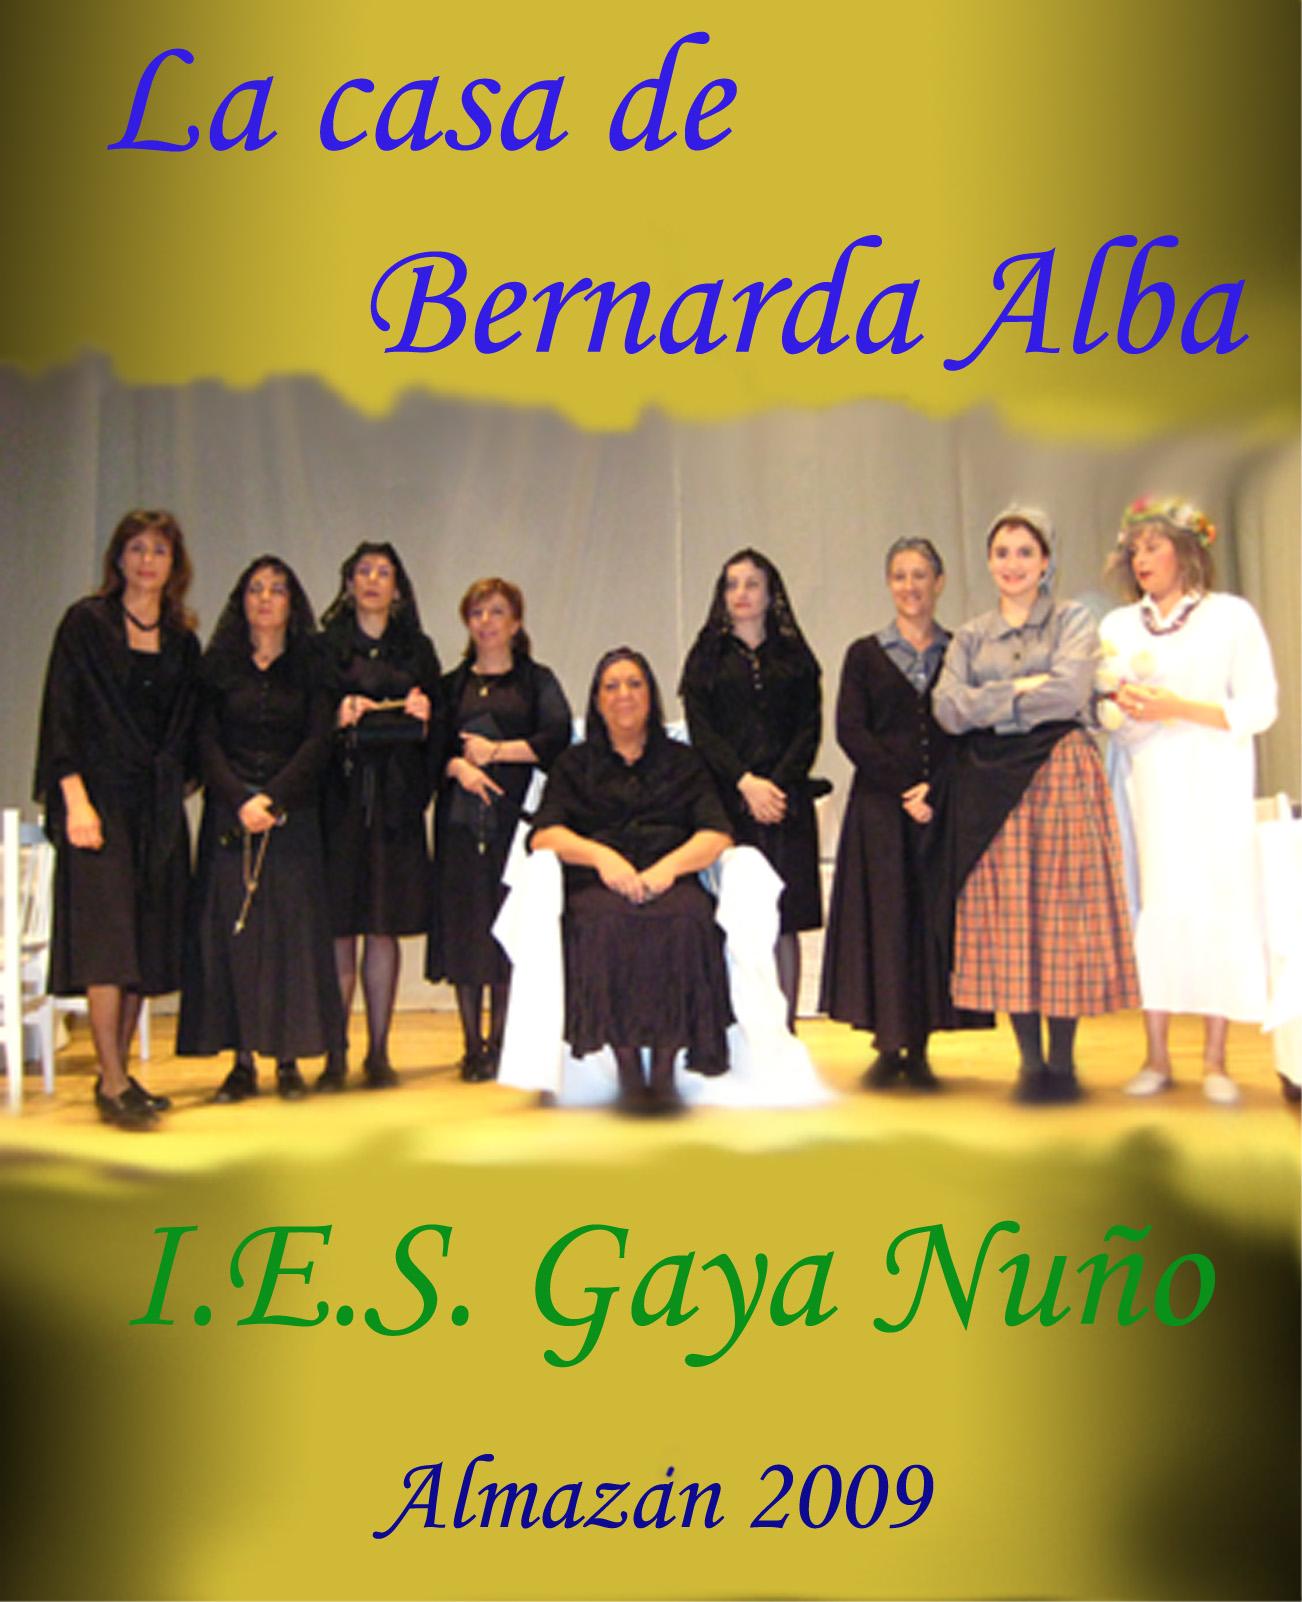 GAYA NUÑO ALMAZAN